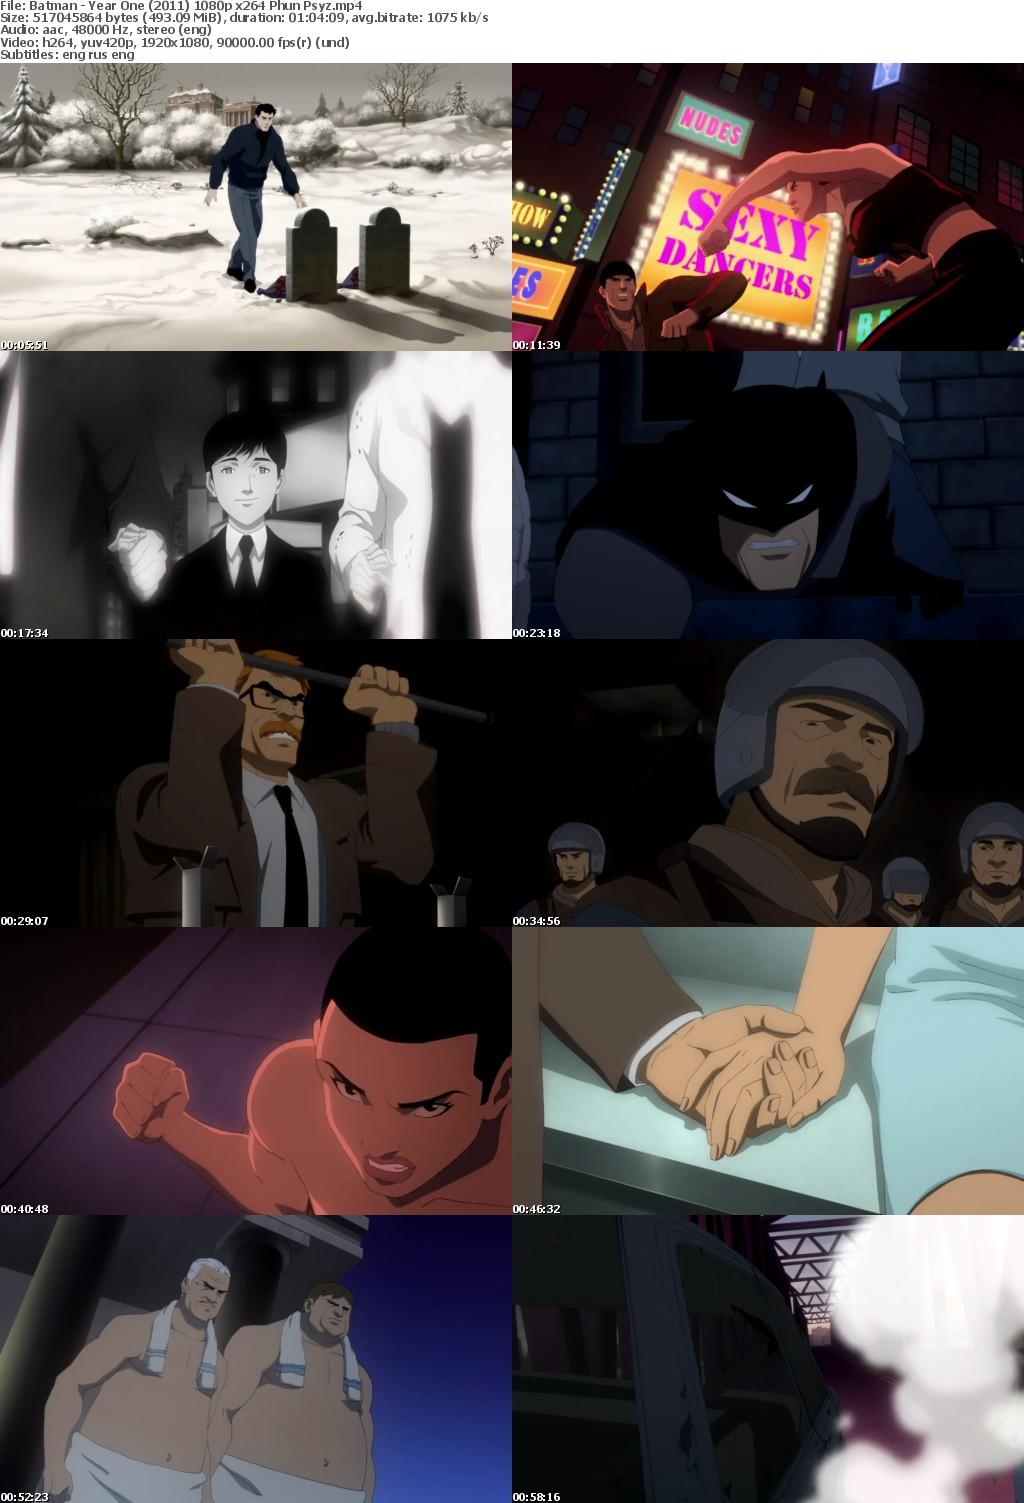 Batman - Year One (2011) 1080p BluRay x264-Phun.Psyz